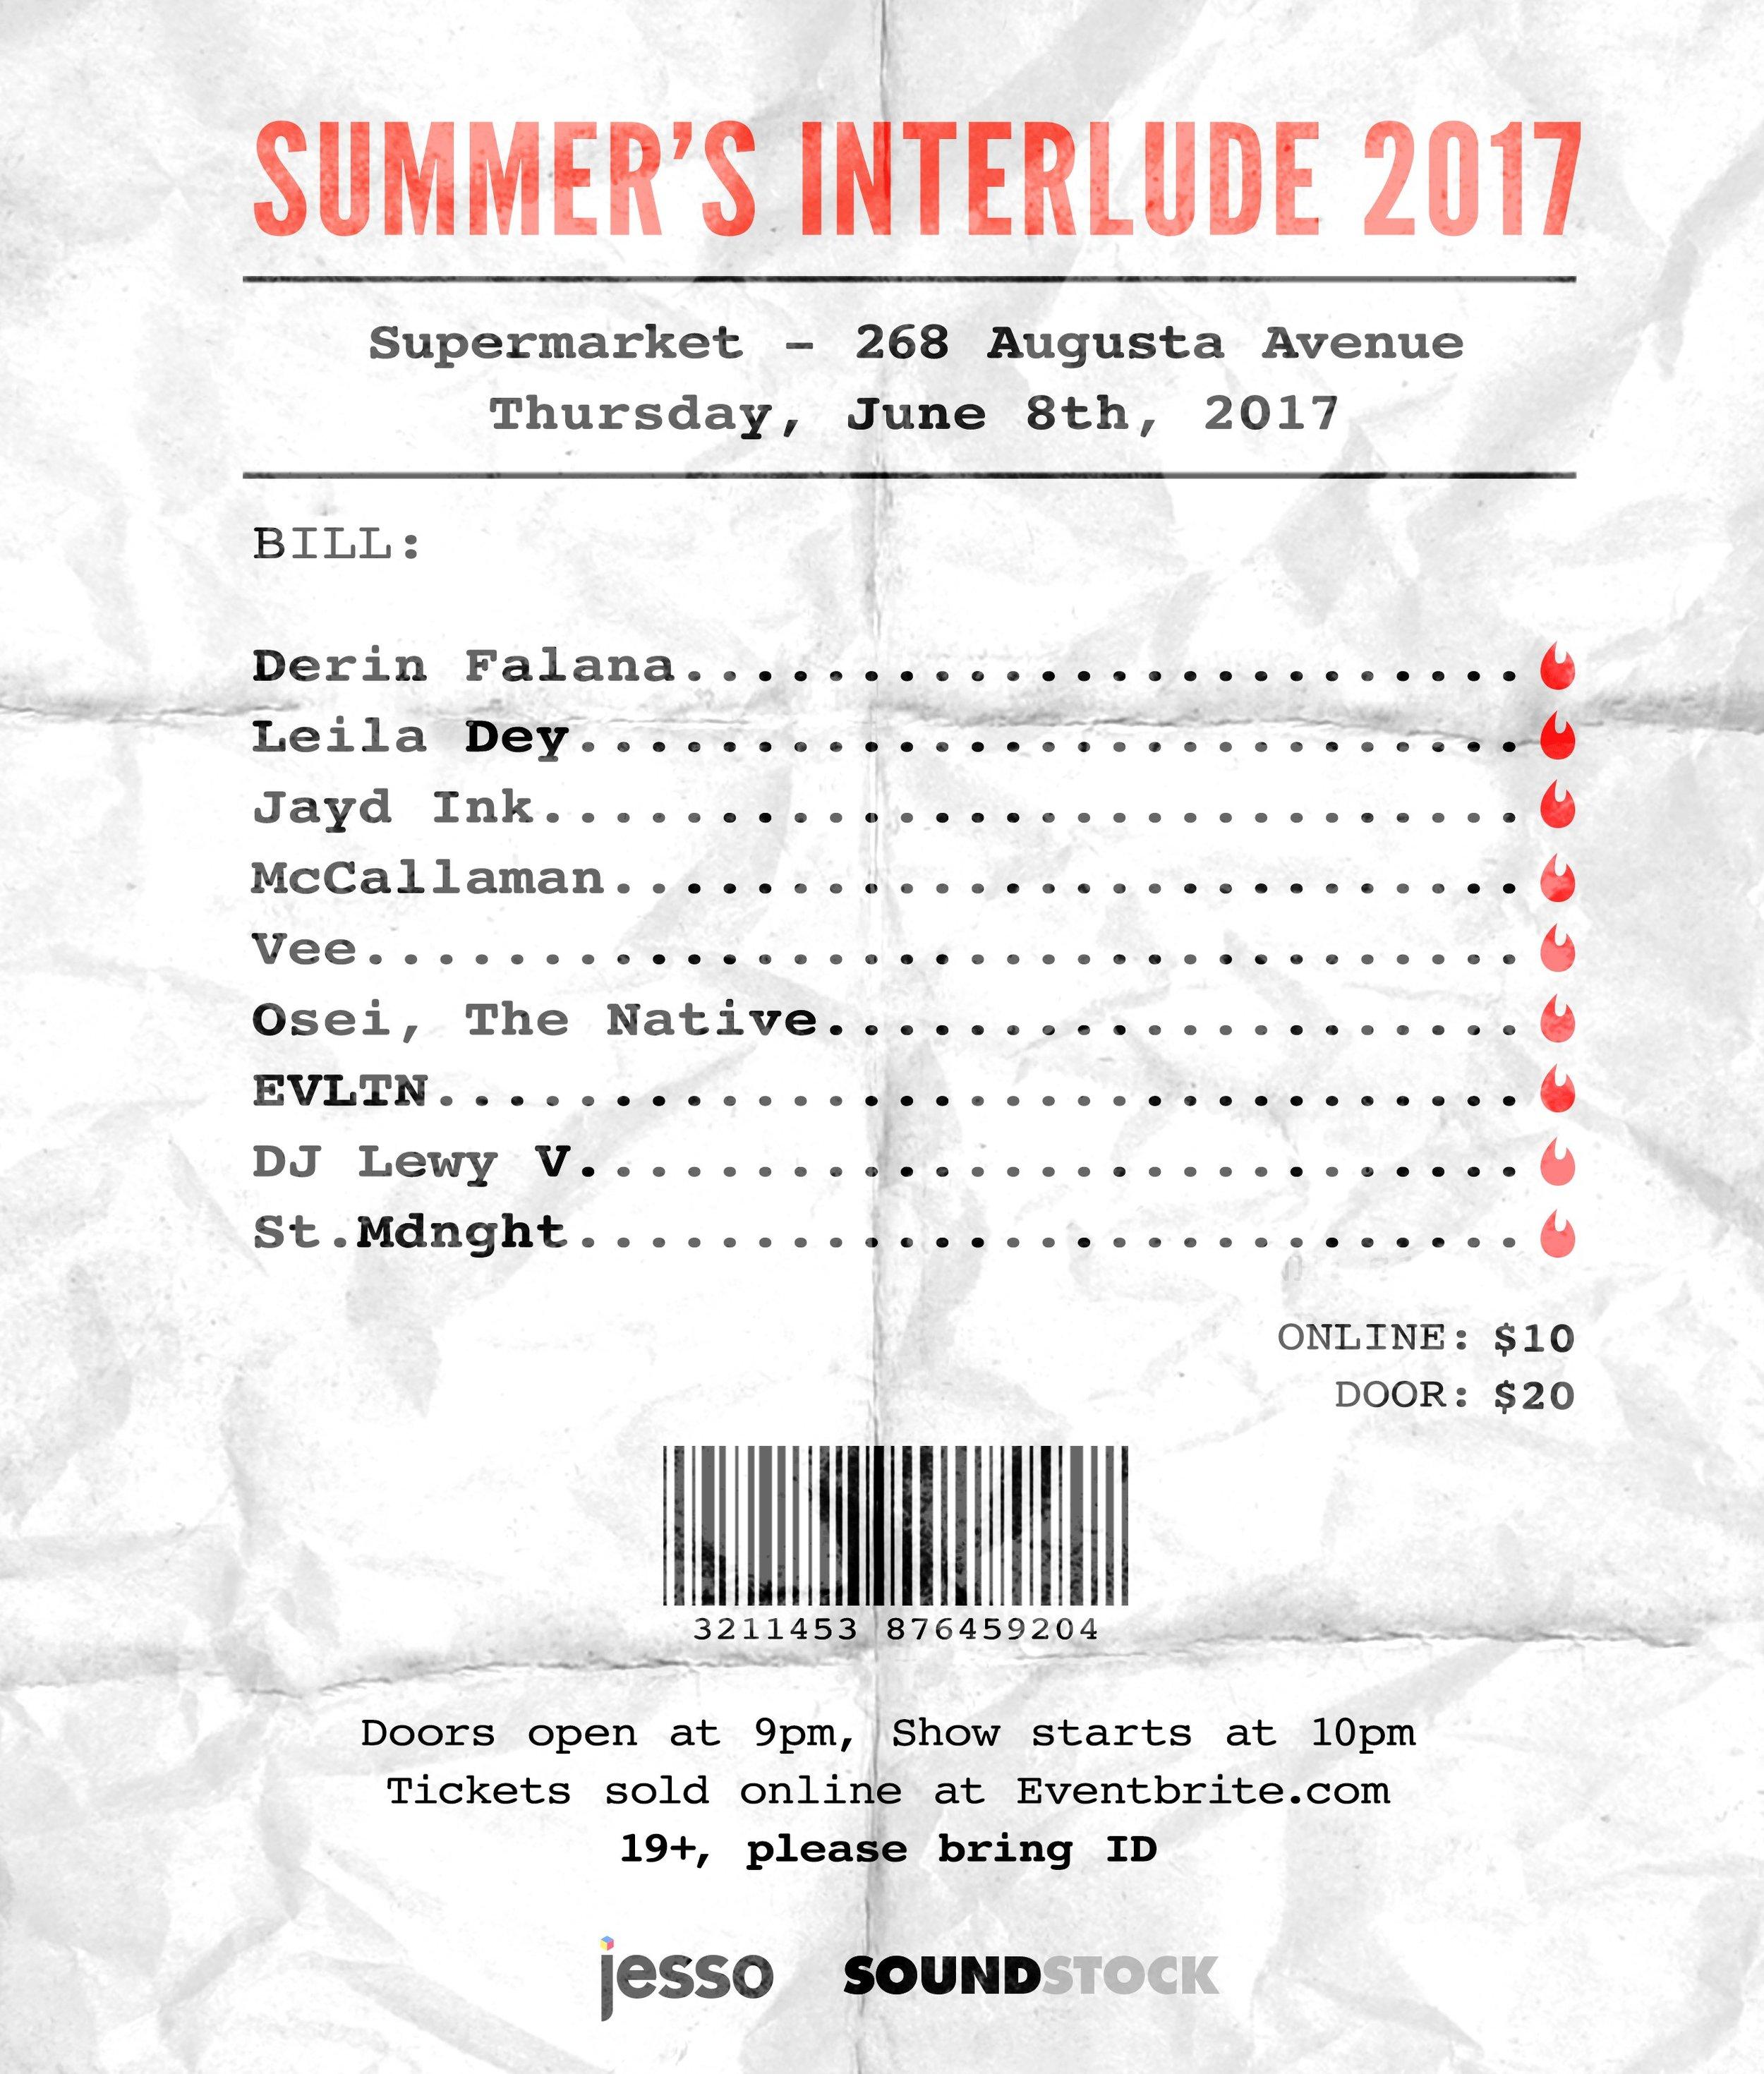 Summers Interlude